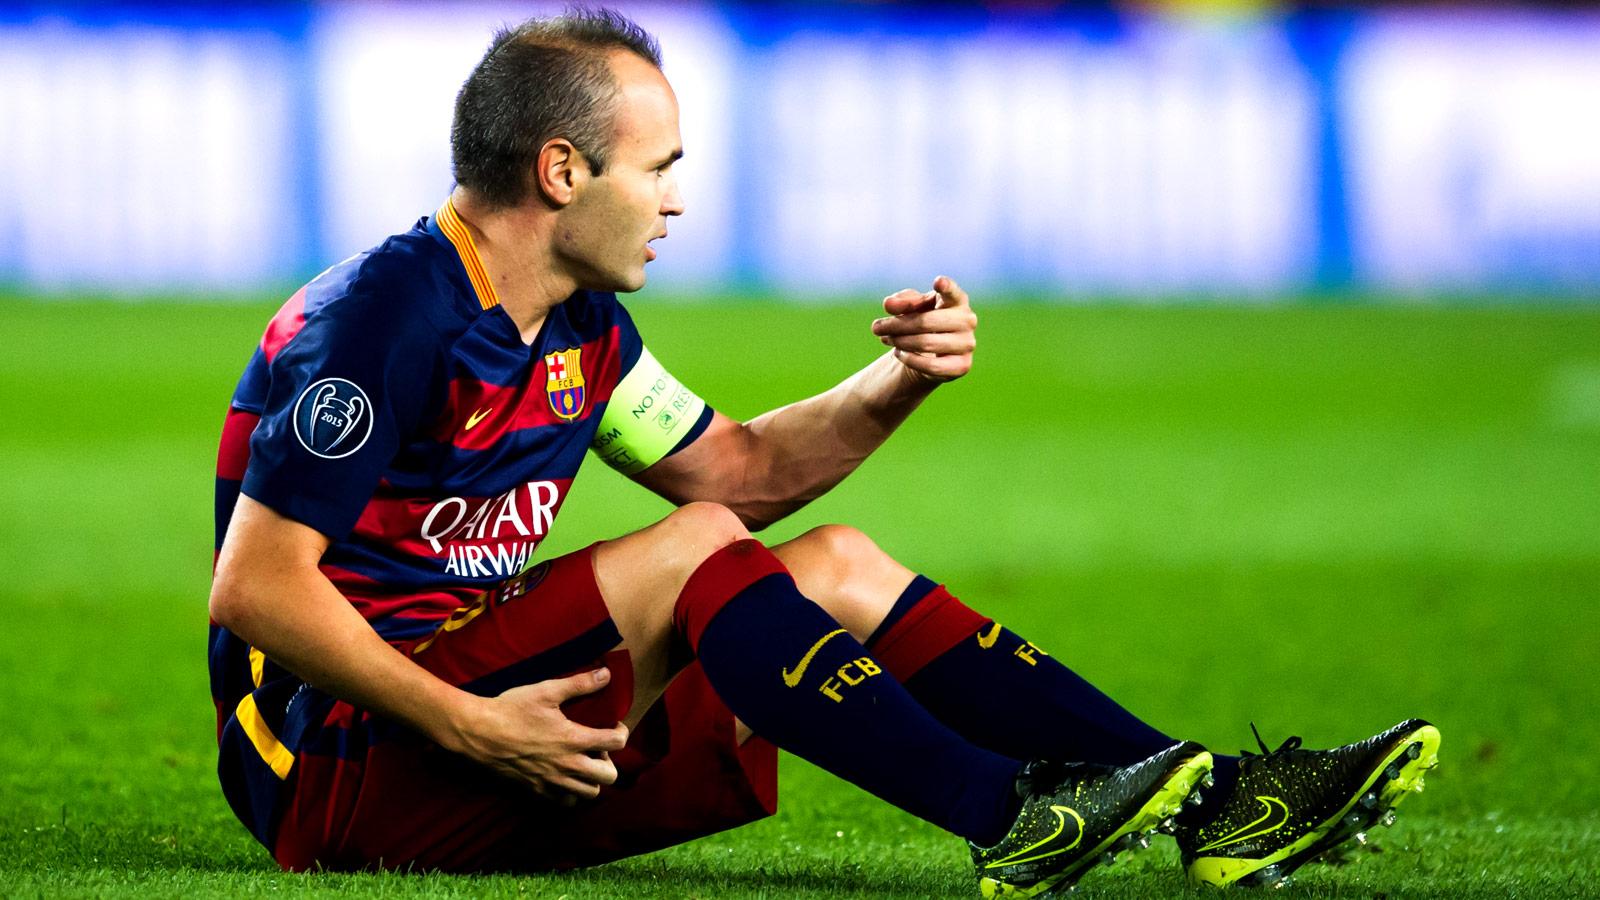 Barcelona captain Andres Iniesta set to return against Eibar